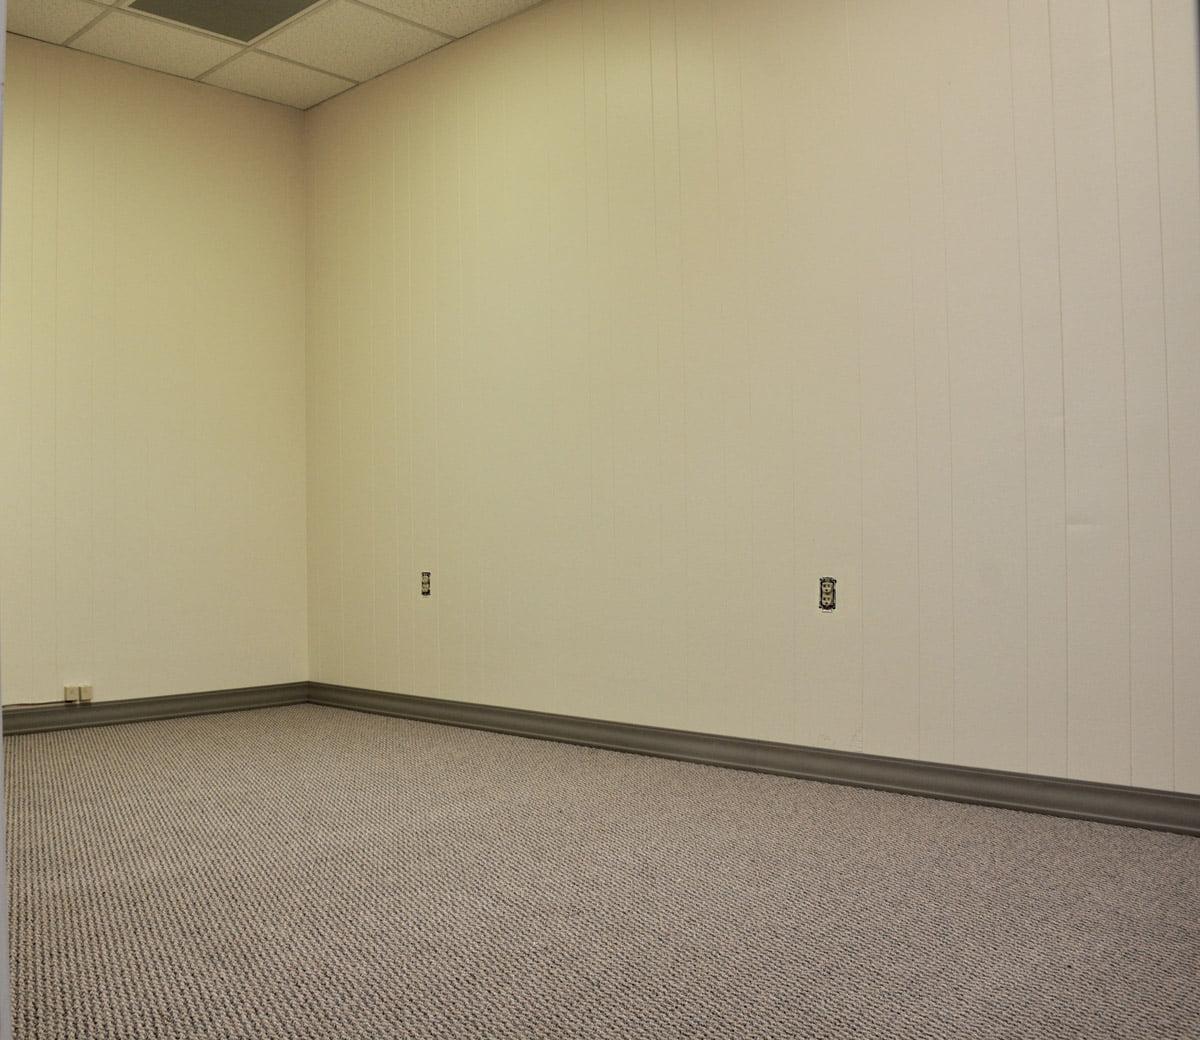 325 F Street - Office or Storage Room